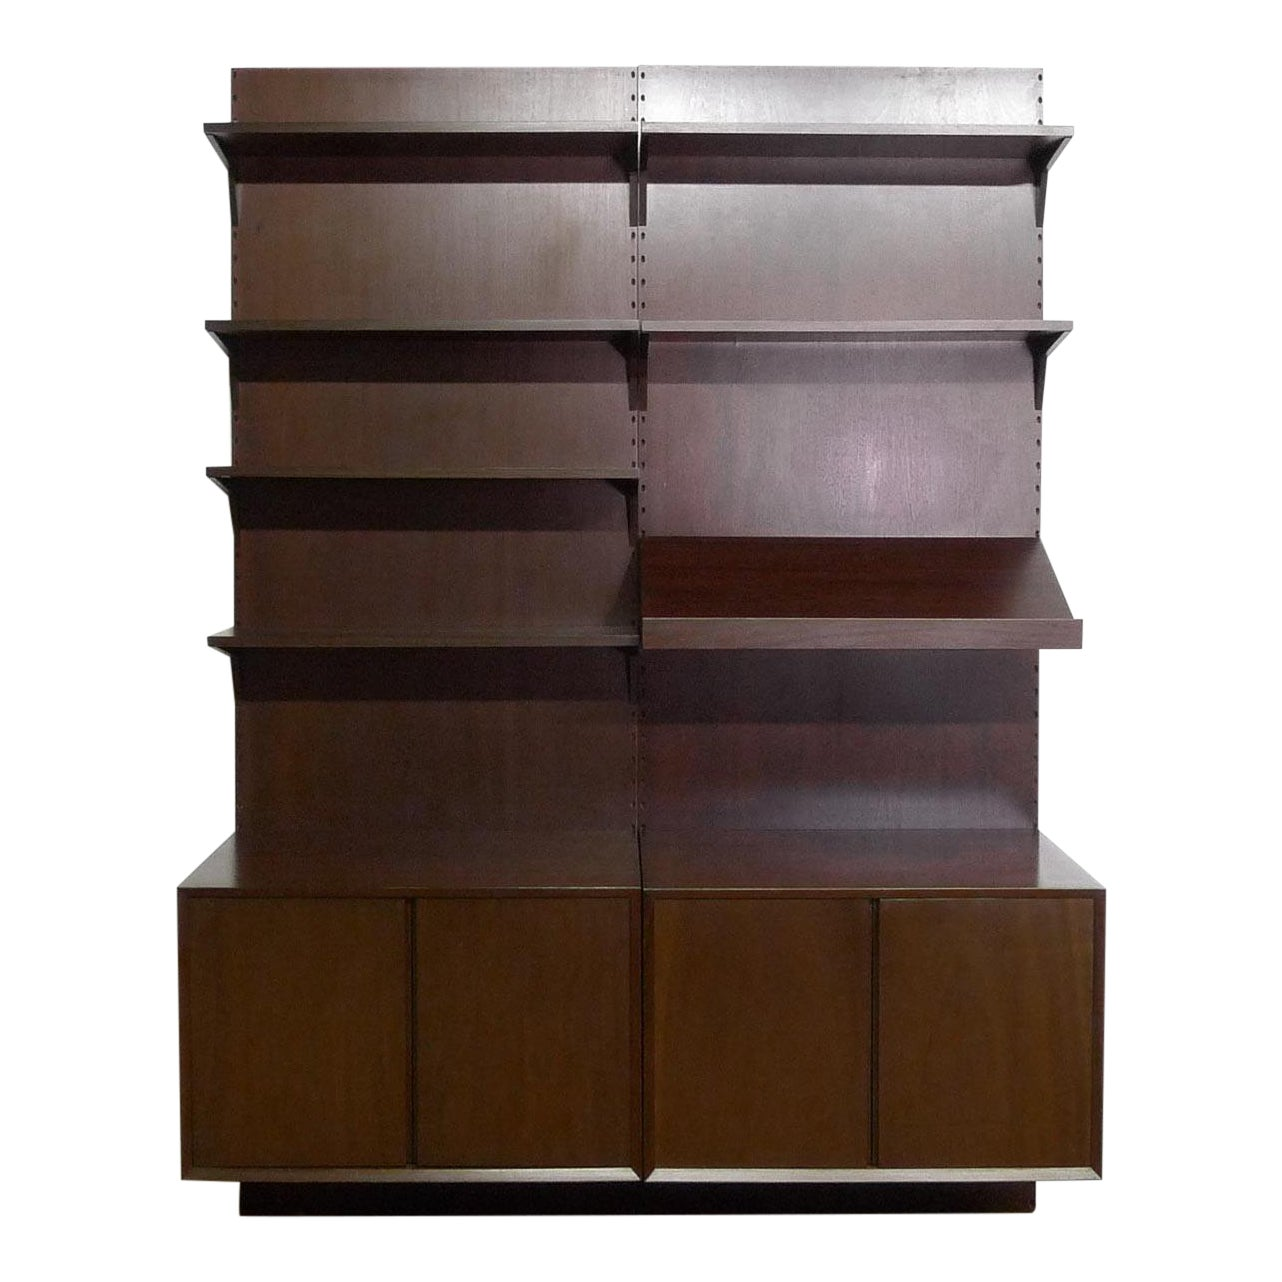 Armoire Comptoir De Famille 1950s, rare early mahogany royal system 'mettmann' vintage danish wall unit poul cadovius for cado kg düsseldorf germany